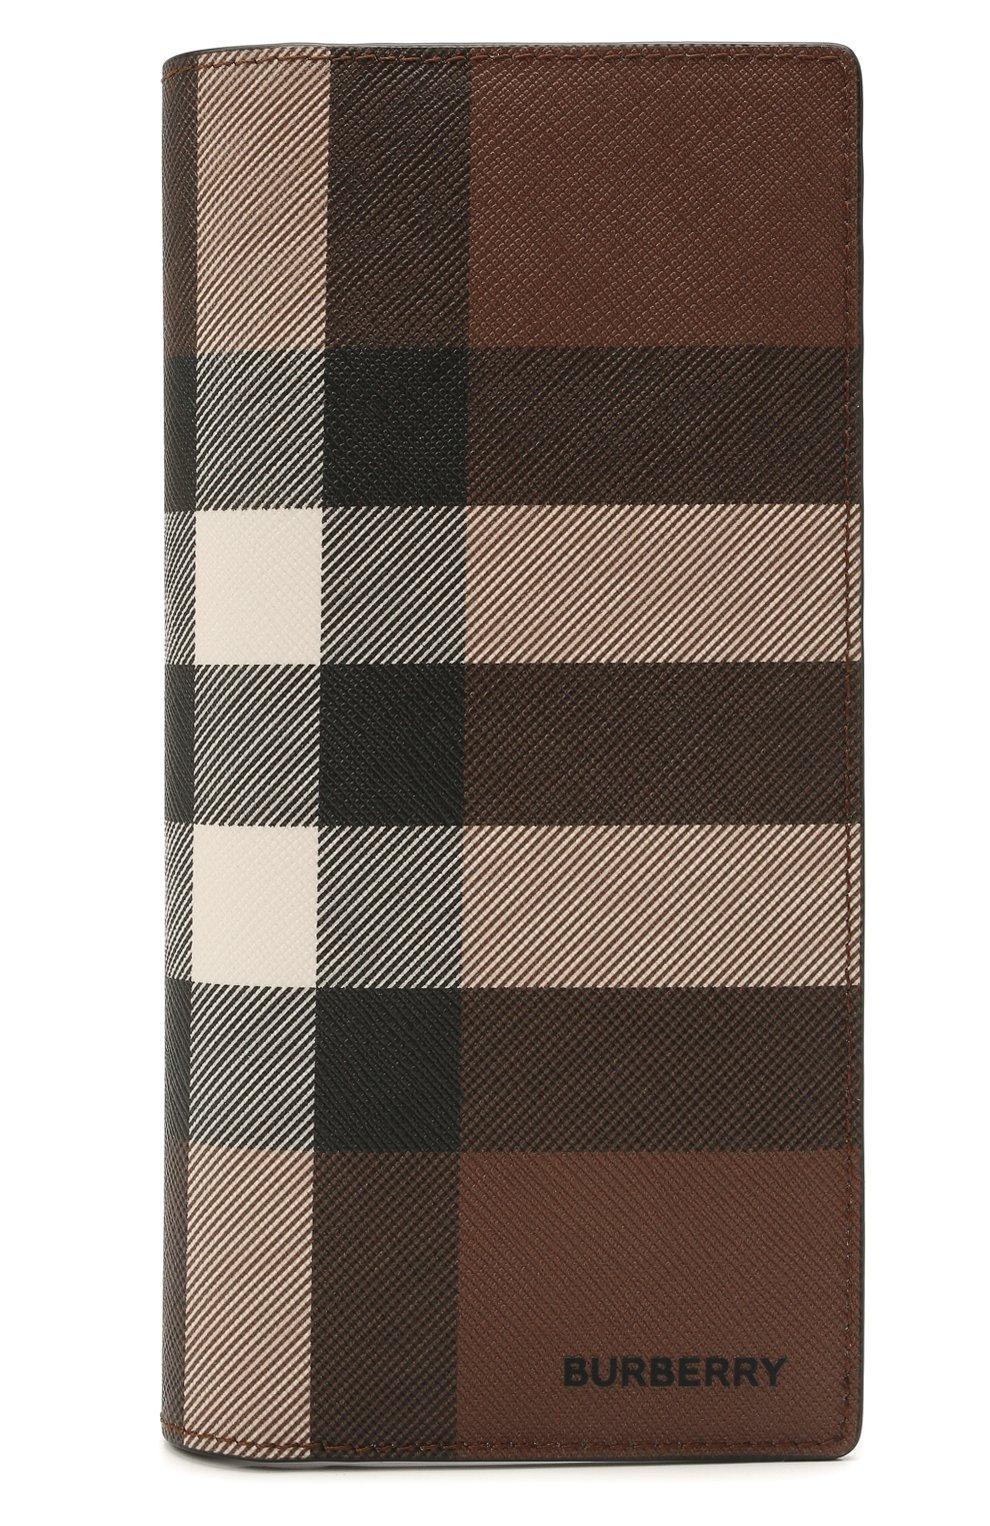 Мужской портмоне BURBERRY коричневого цвета, арт. 8036670 | Фото 1 (Материал: Экокожа)